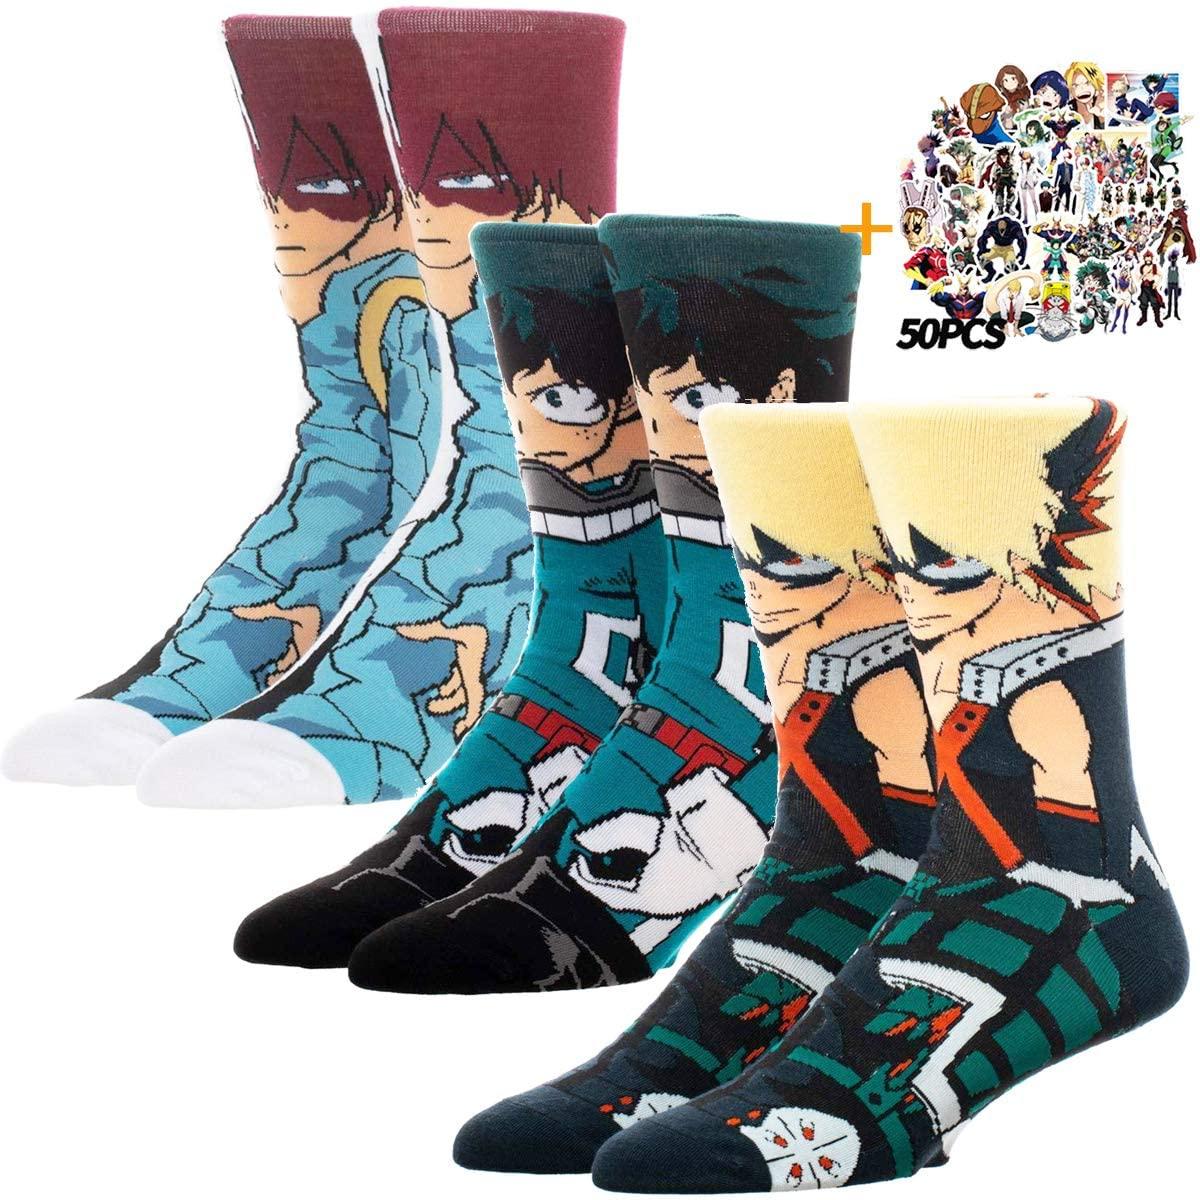 My Hero Academia Character Socks Izuku Katsuki Shoto Todoroki Cosplay Socks Women & Men's (Izuku+Katsuki+Todoroki)